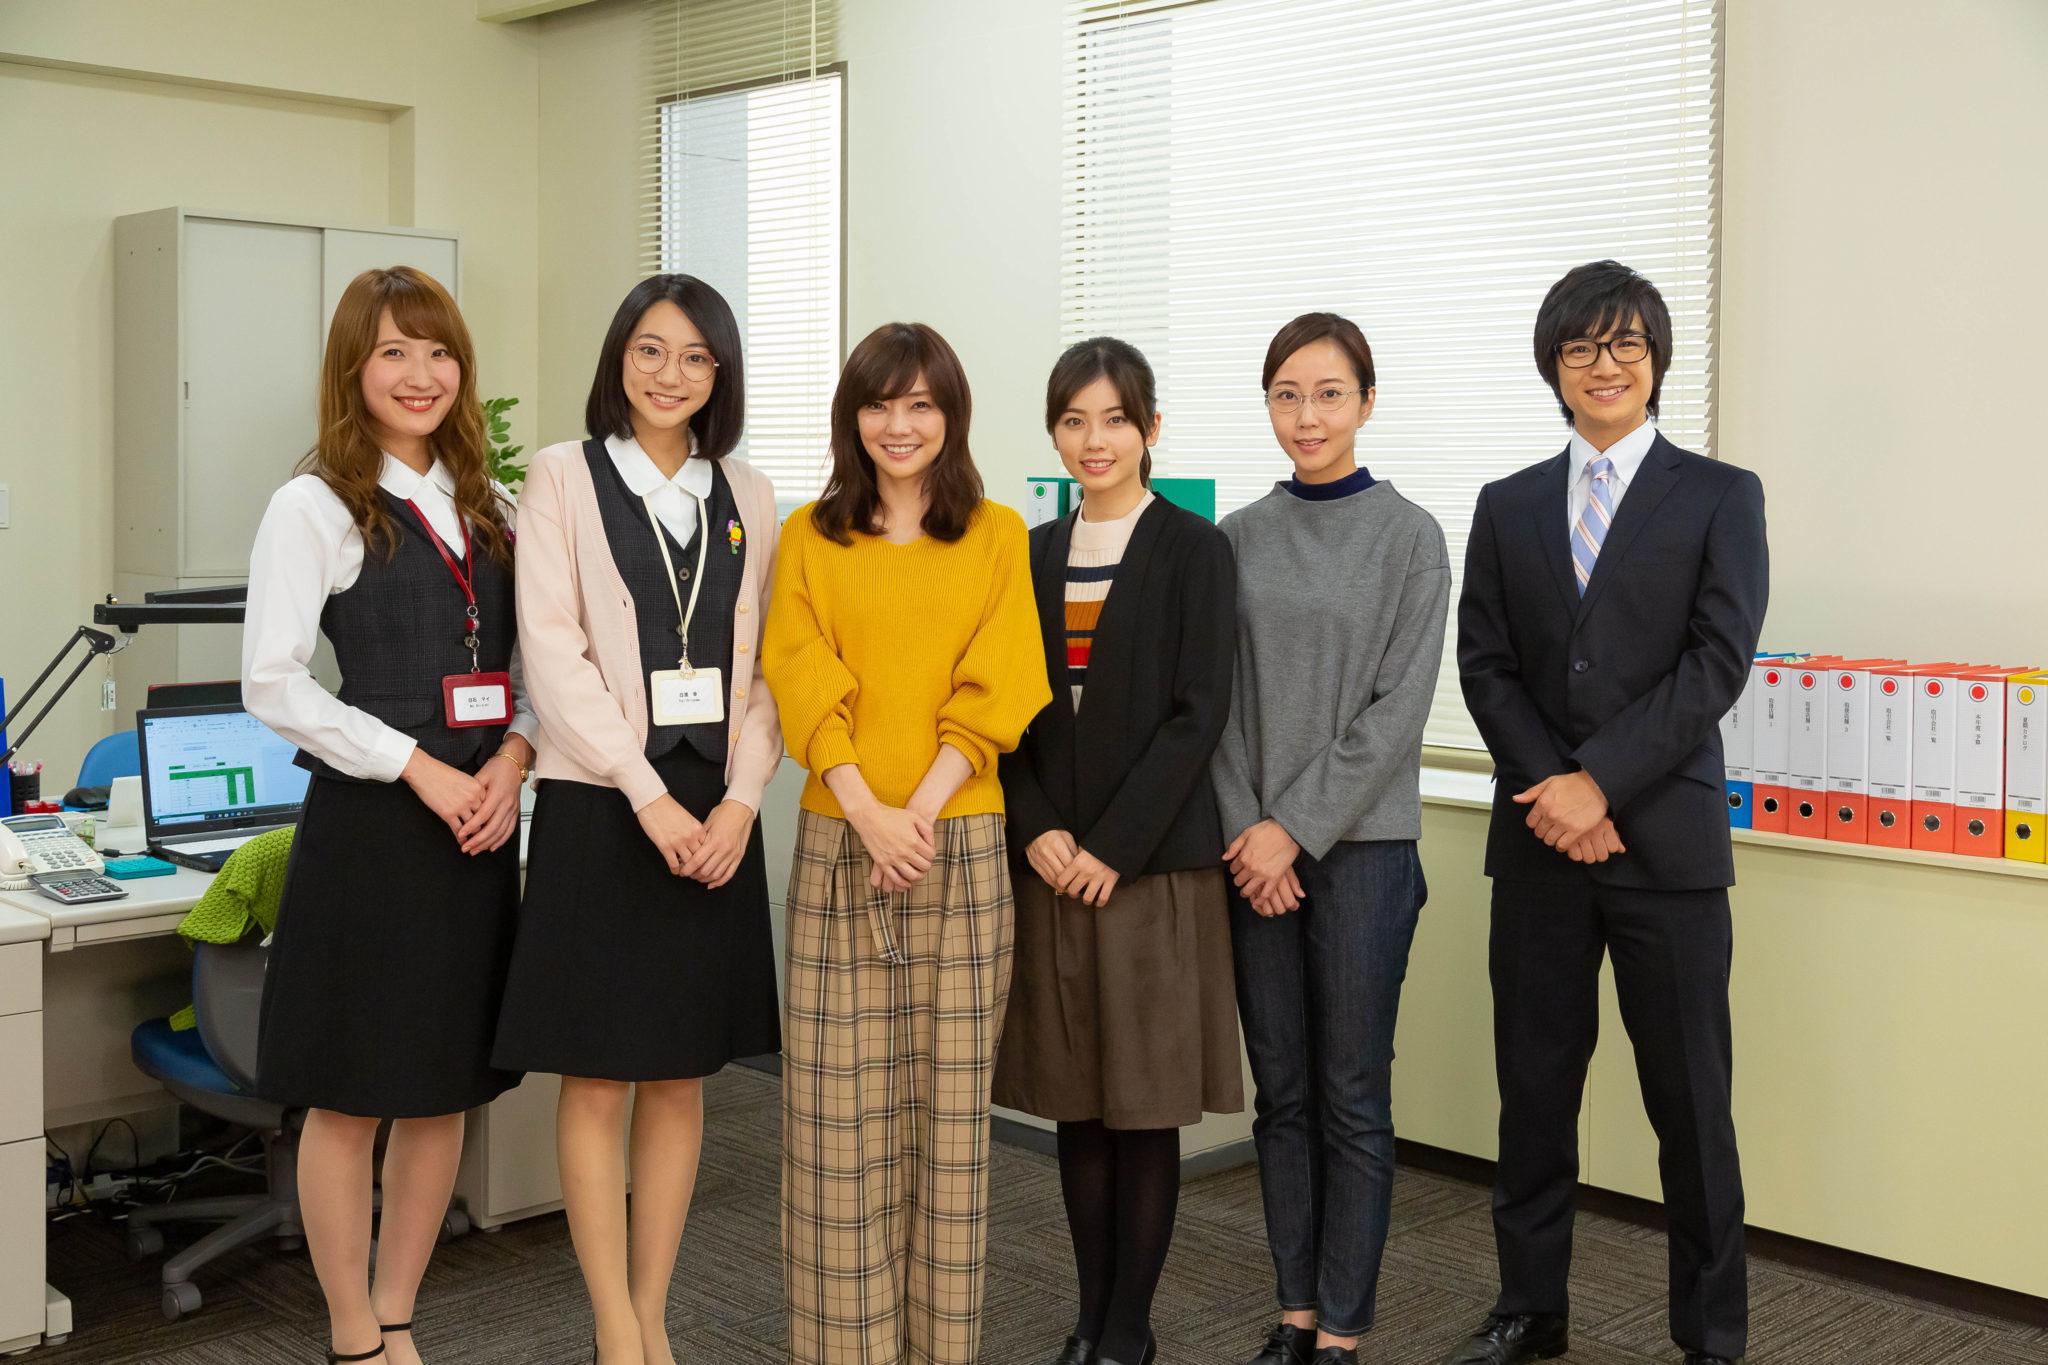 NHKドラマ10『トクサツガガガ』、隠れオタク演じる小芝風花さん、倉科カナさんらが会見! - 趣味女子を応援するメディア「めるも」